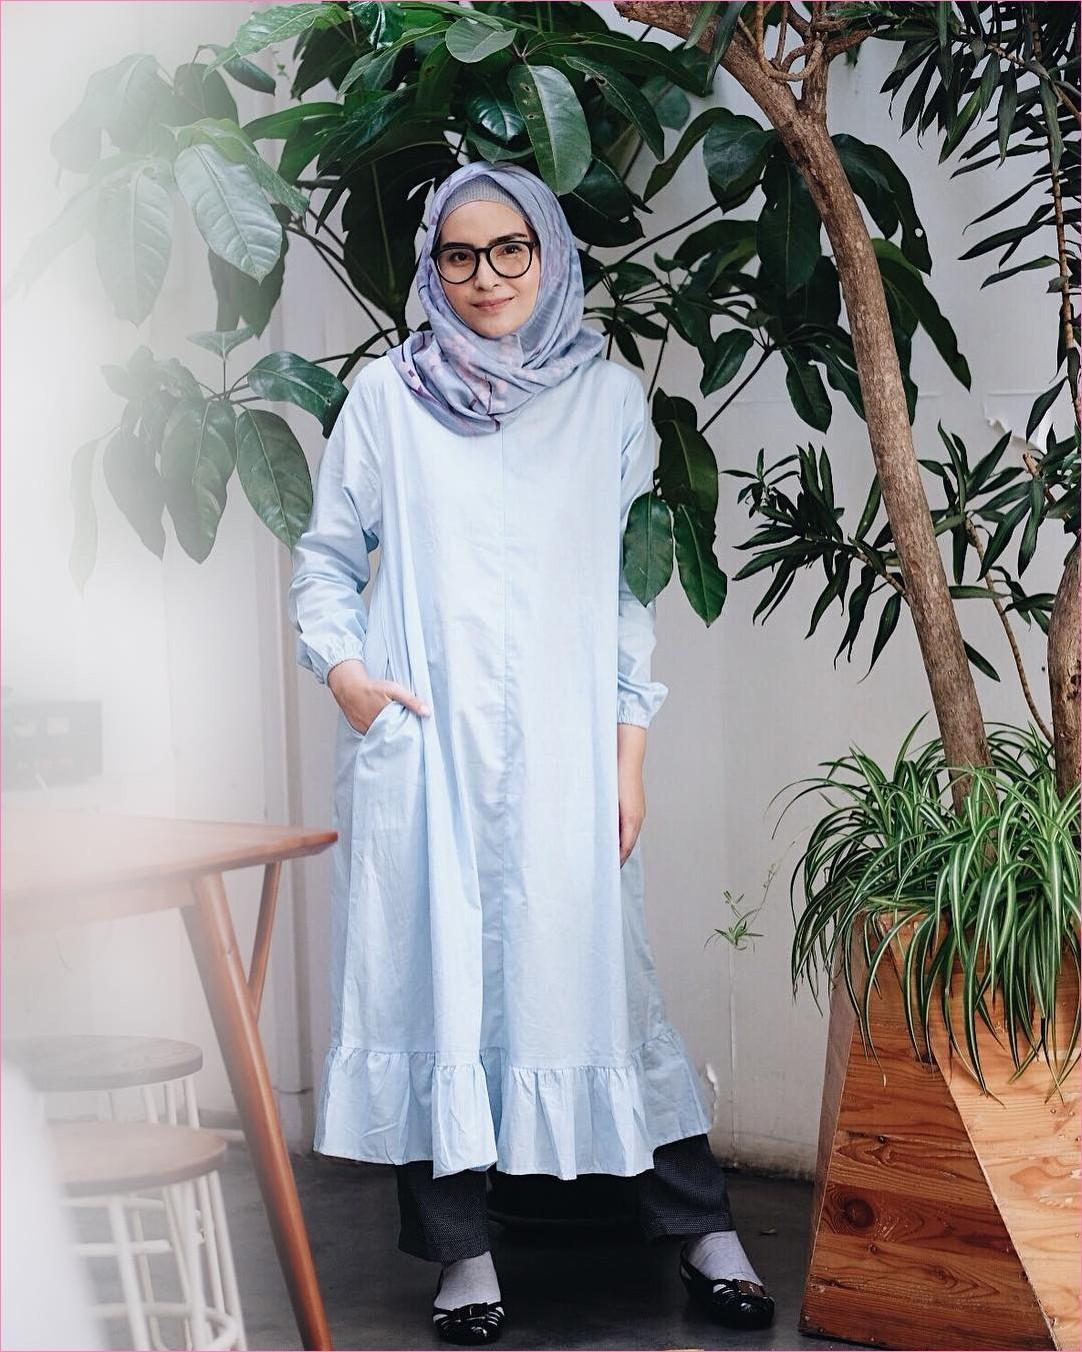 Outfit Baju Tunic Untuk Hijabers Ala Selebgram 2018 baju tunic biru muda celana kulot celana bahan abu tua flatshoes hitam kaos kaki putih ciput rajut abu muda kerudung segiempat hijab square kacamata ootd kekinian trendy